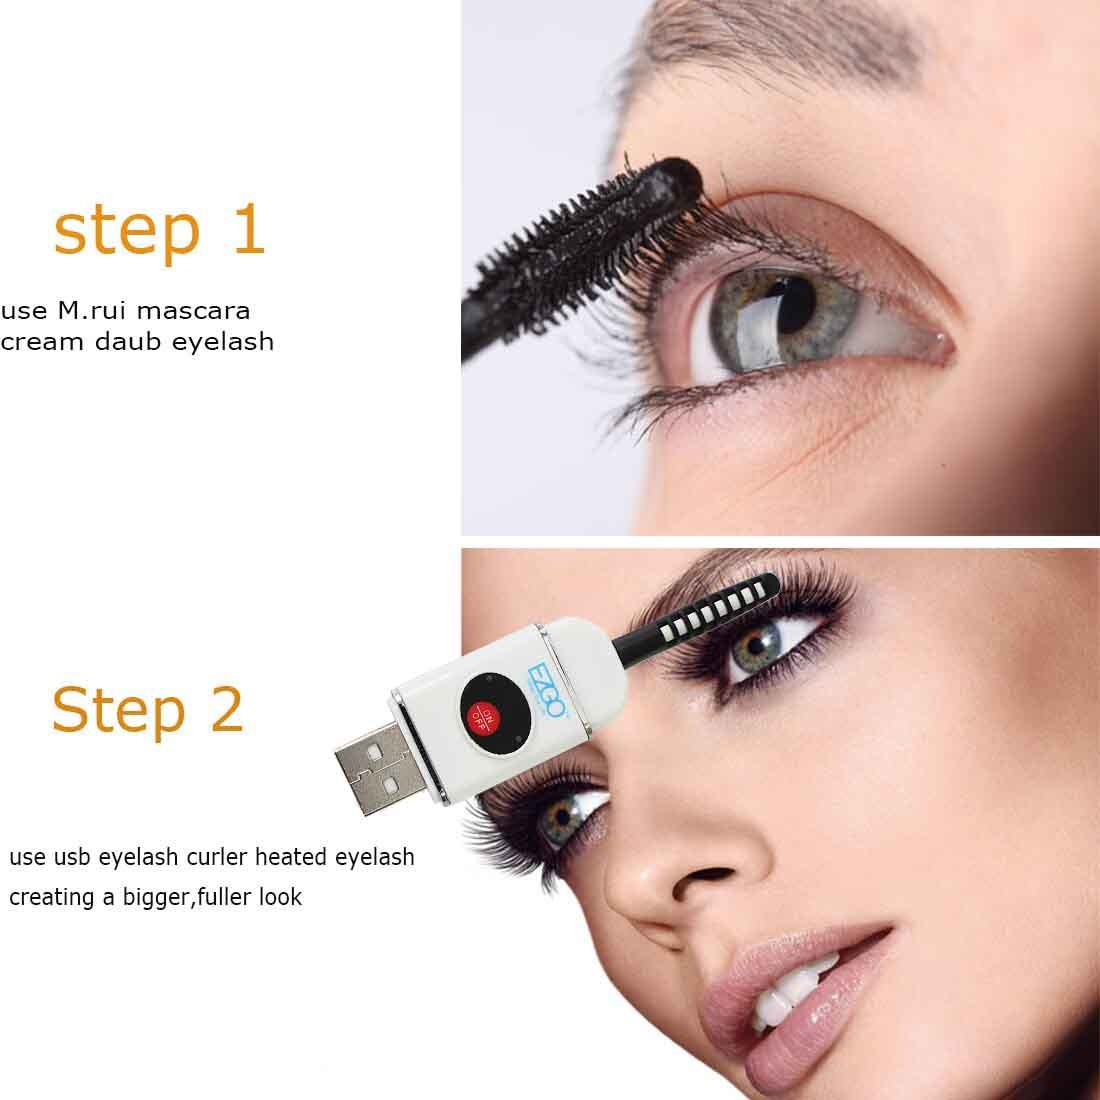 how to use eyelash curler. ezgo professional usb portable eyelash curler,mini rechargeable heating rod, beauty heated eye lashes crimper tools(white): amazon.co.uk: how to use curler